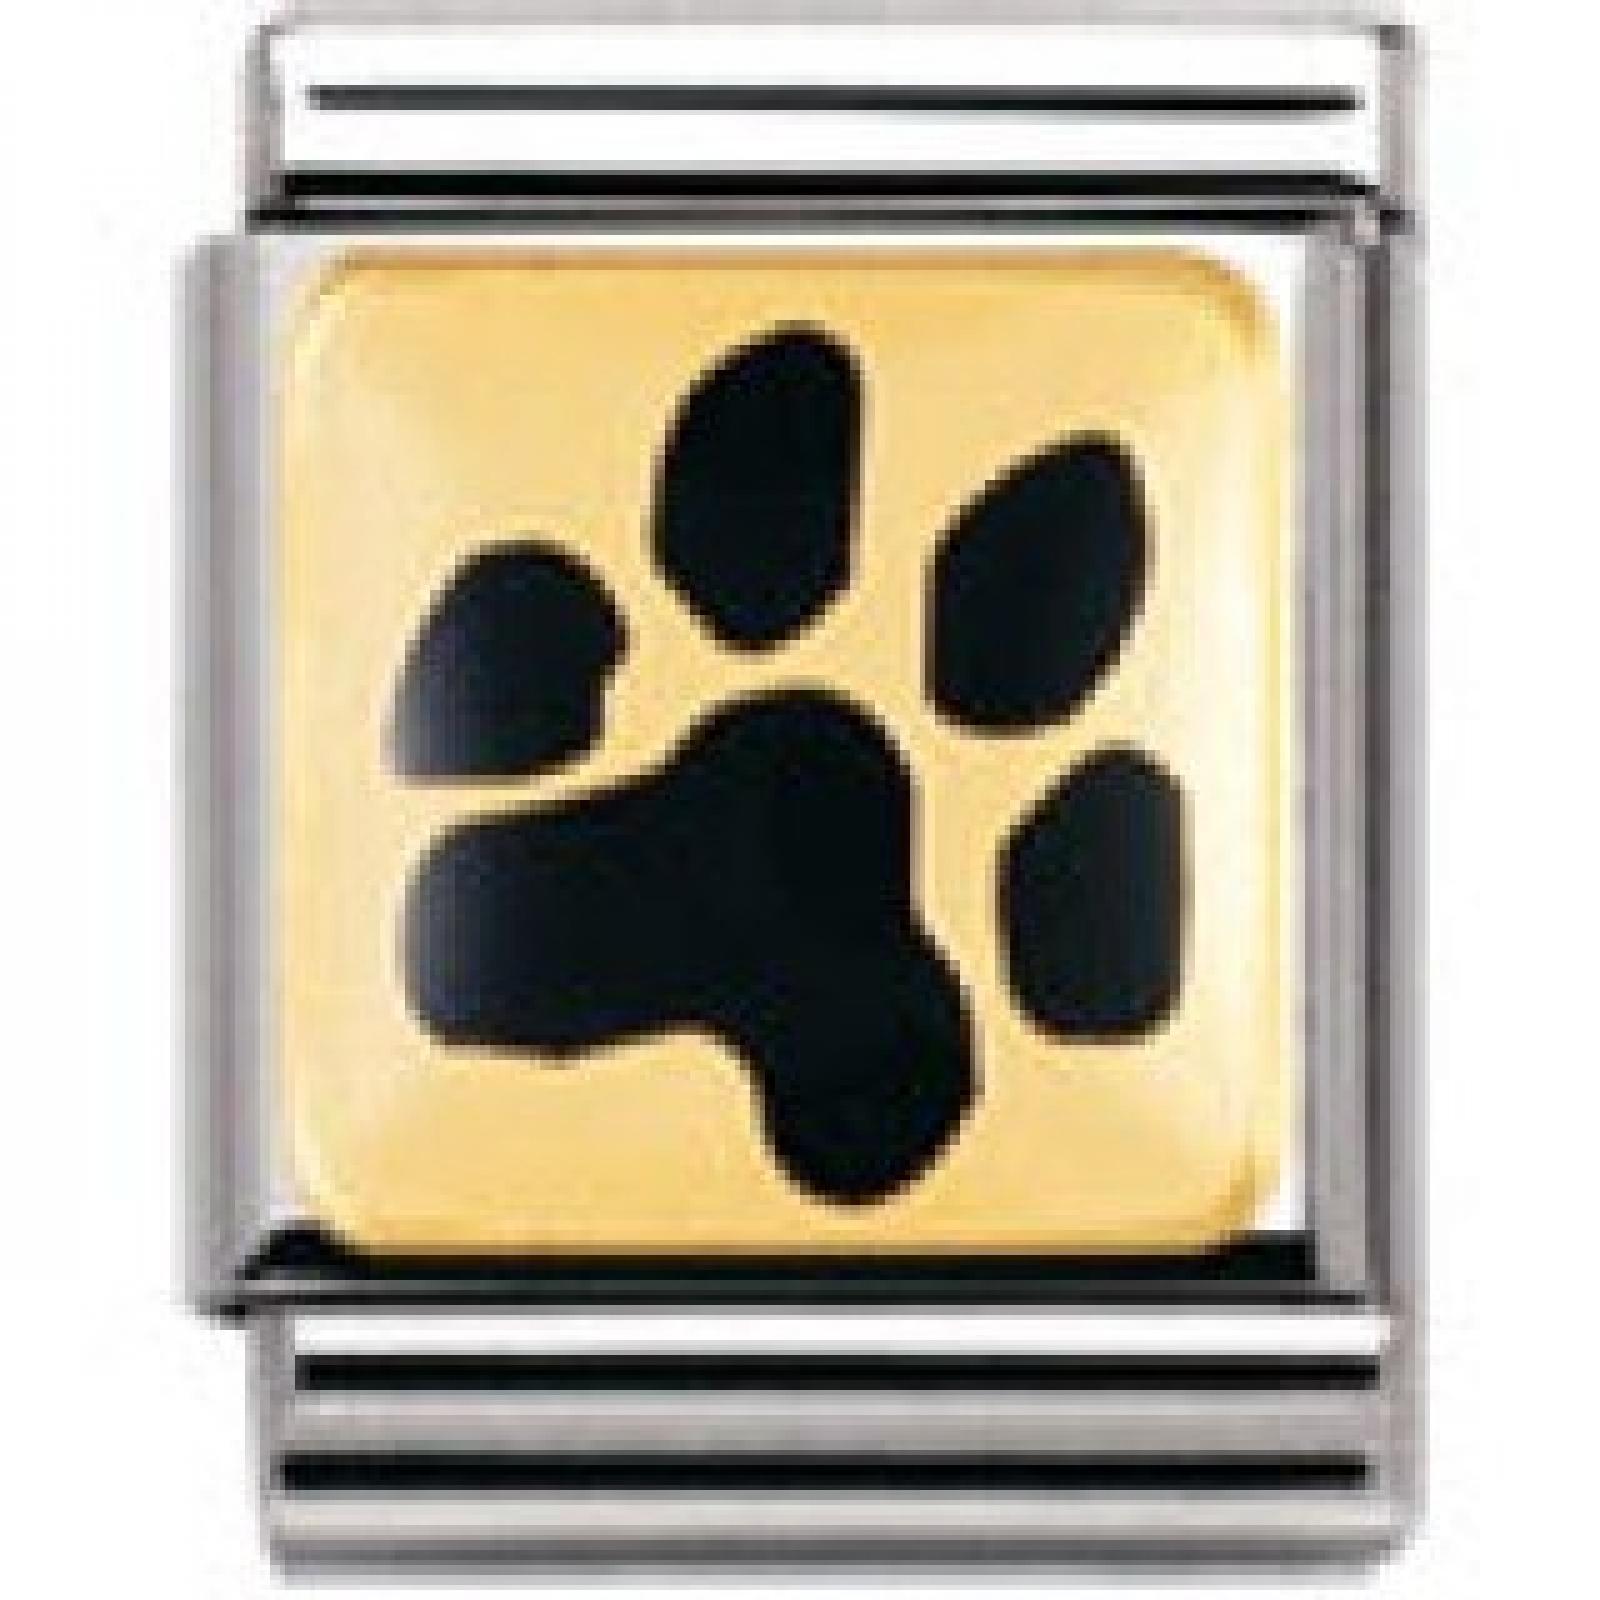 Nomination Composable Big TIERE - LAND (Abdruck Hundepfote) ( 032210-35)